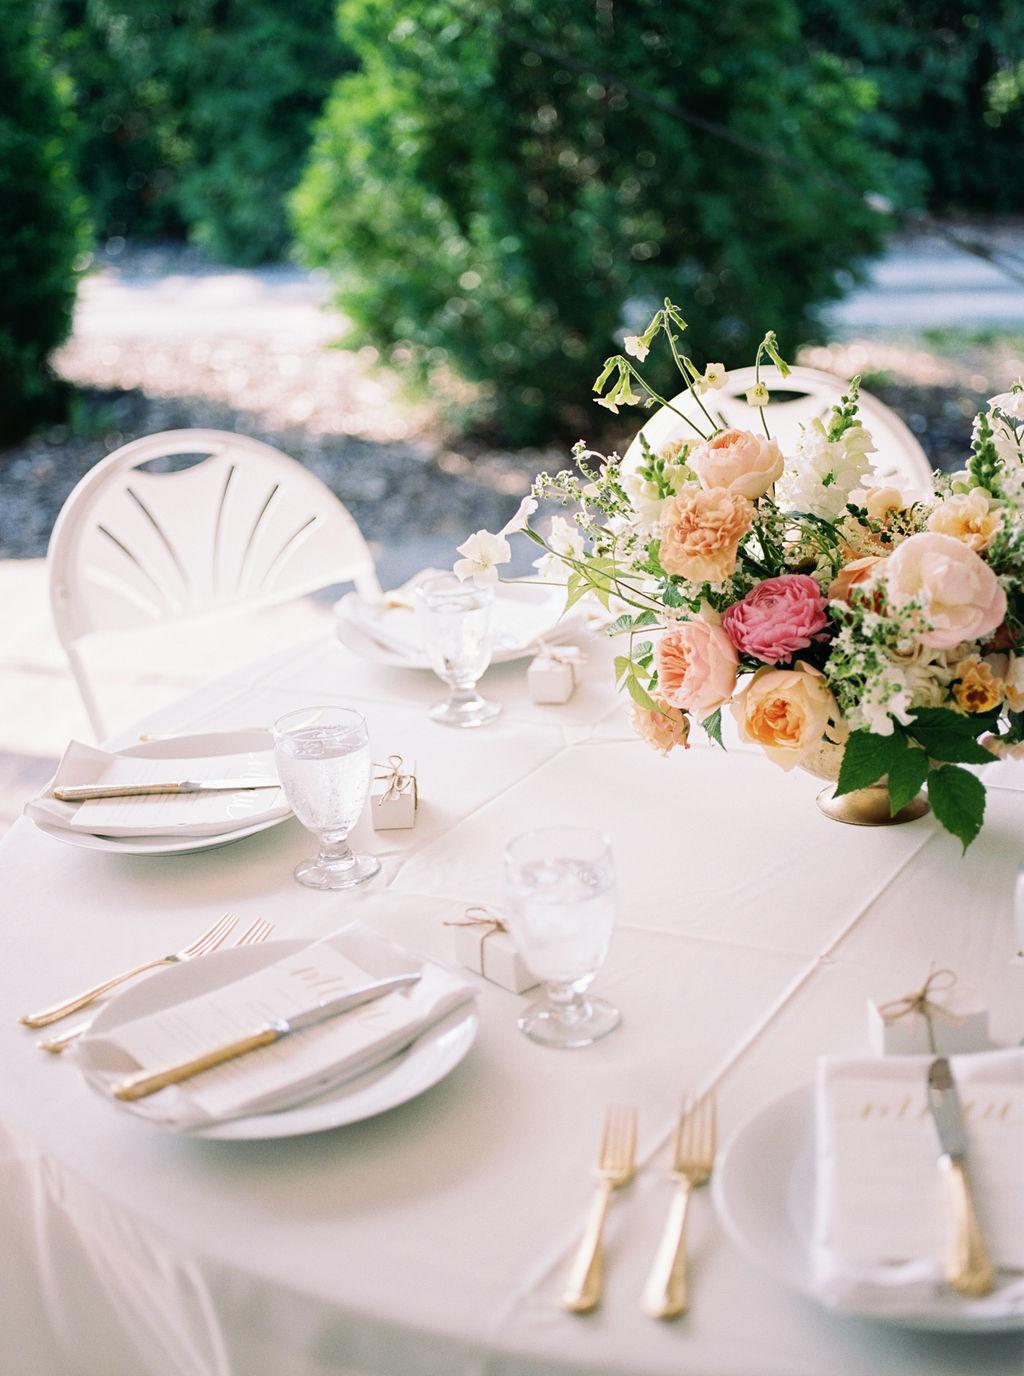 Alexandra-Elise-Photography-Film-Wedding-Photographer-Sonnenberg-Gardens-Finger-Lakes-Canandaigua-Reception-008.jpg